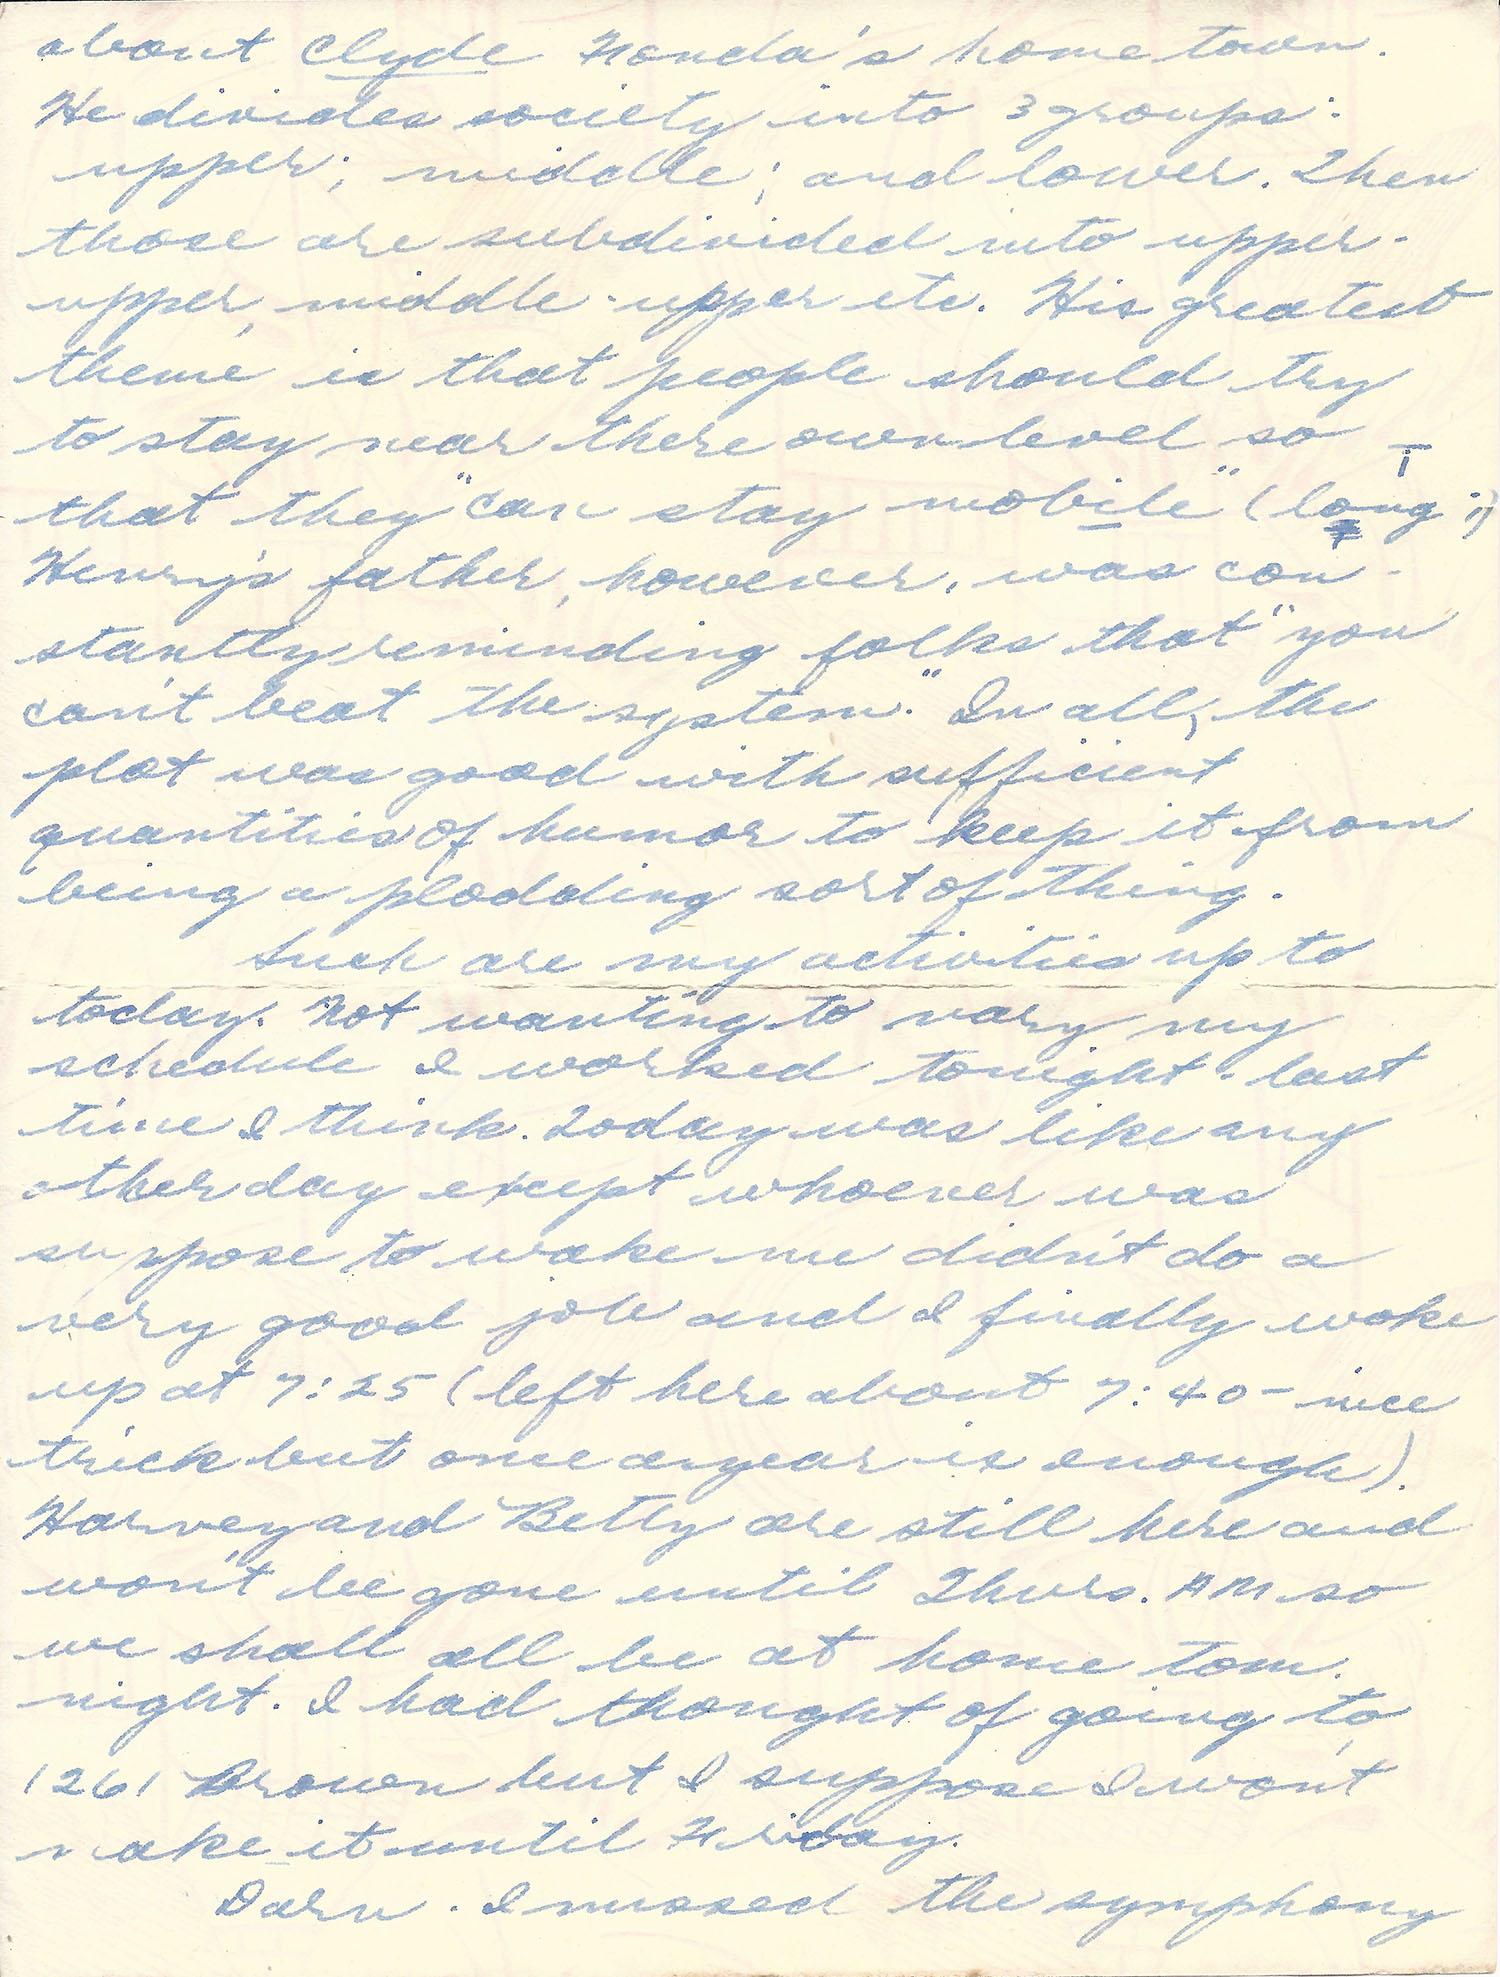 Feb. 24, 1953 (Marj), Page 2